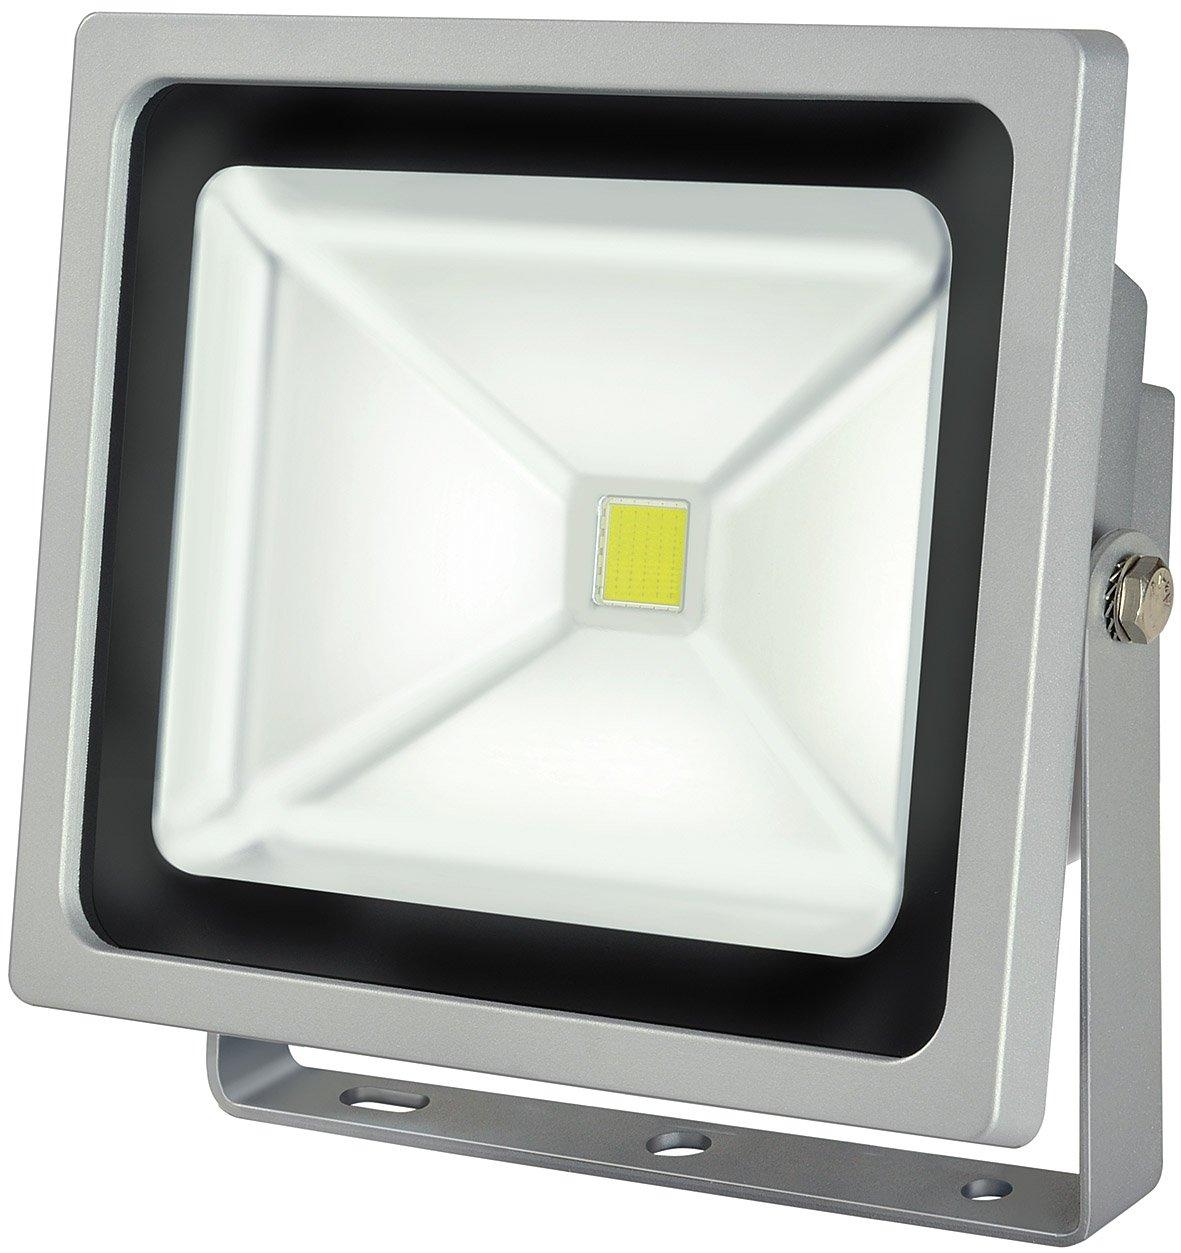 Brennenstuhl Chip-LED-Leuchte / LED Strahler außen (robuster Außenstrahler 50 Watt, Baustrahler IP65 geprüft, LED Fluter Tageslicht) Farbe: silber [Energieklasse A] 1171250521